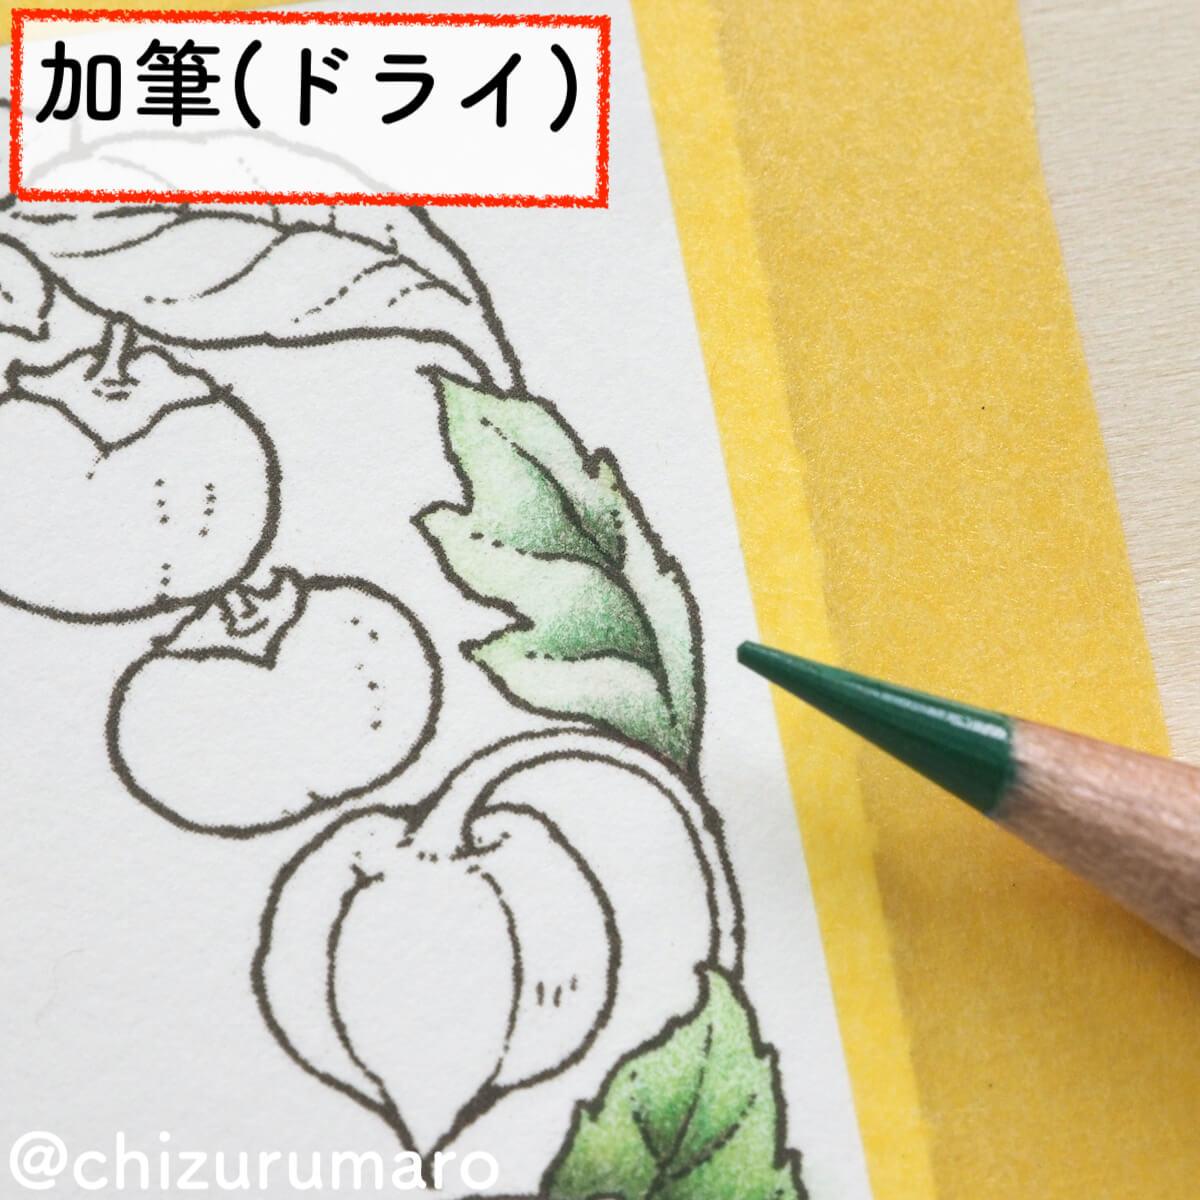 f:id:chizurumaro:20200217145629j:plain